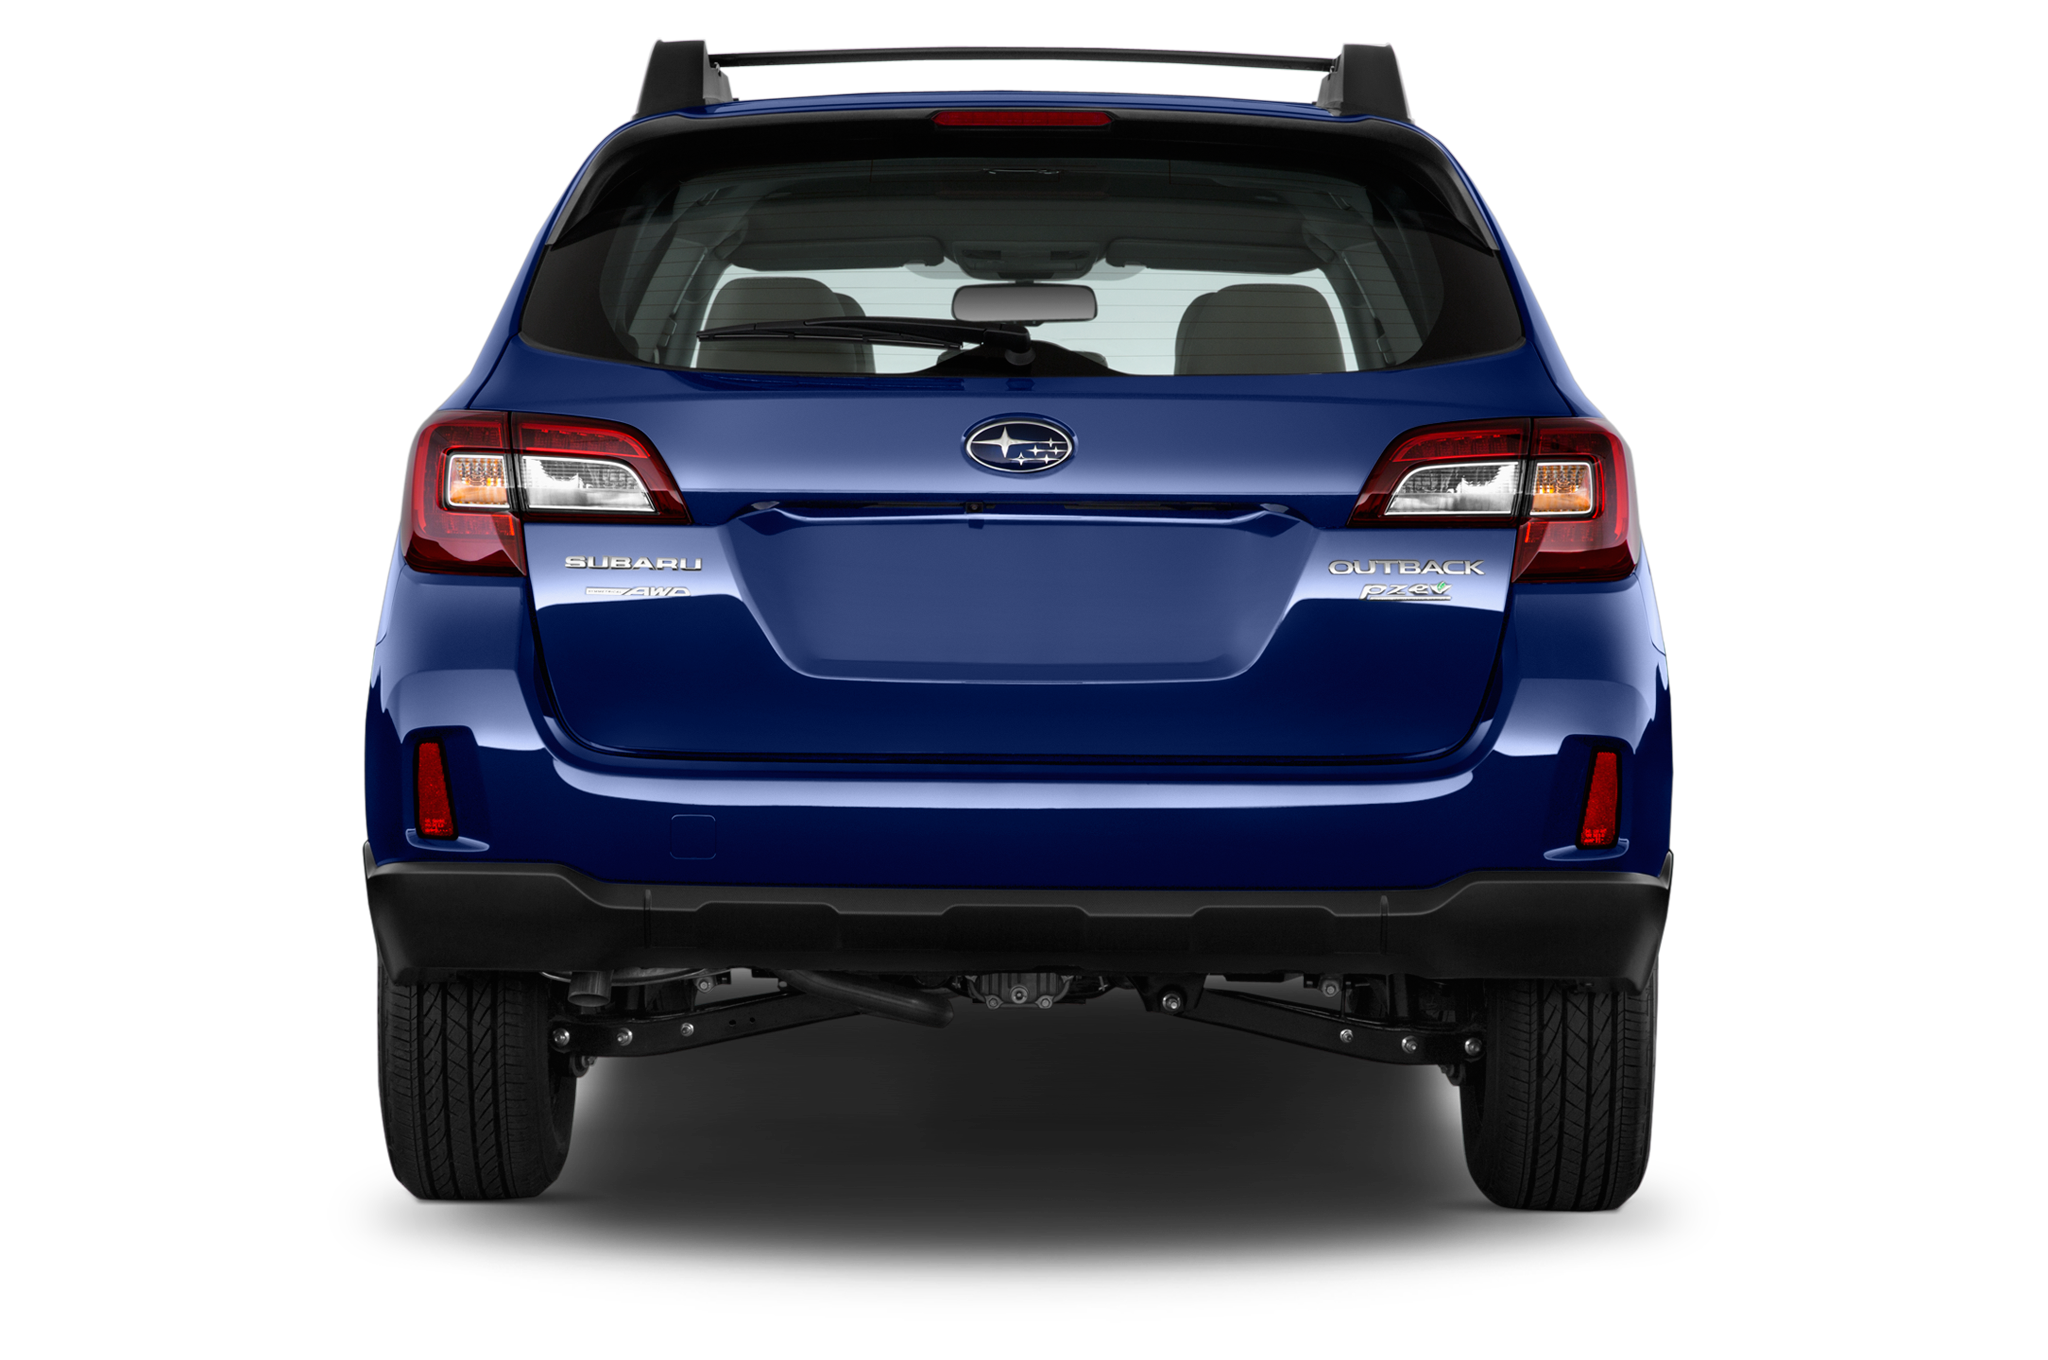 Subaru Legacy 3.6 R >> 2017 Subaru Legacy and Outback Pricing Released | Automobile Magazine